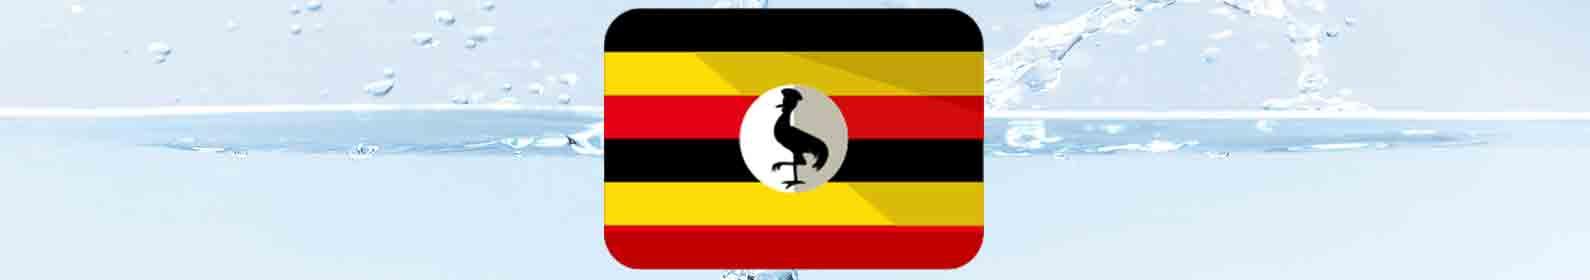 water-treatment-uganda.jpg